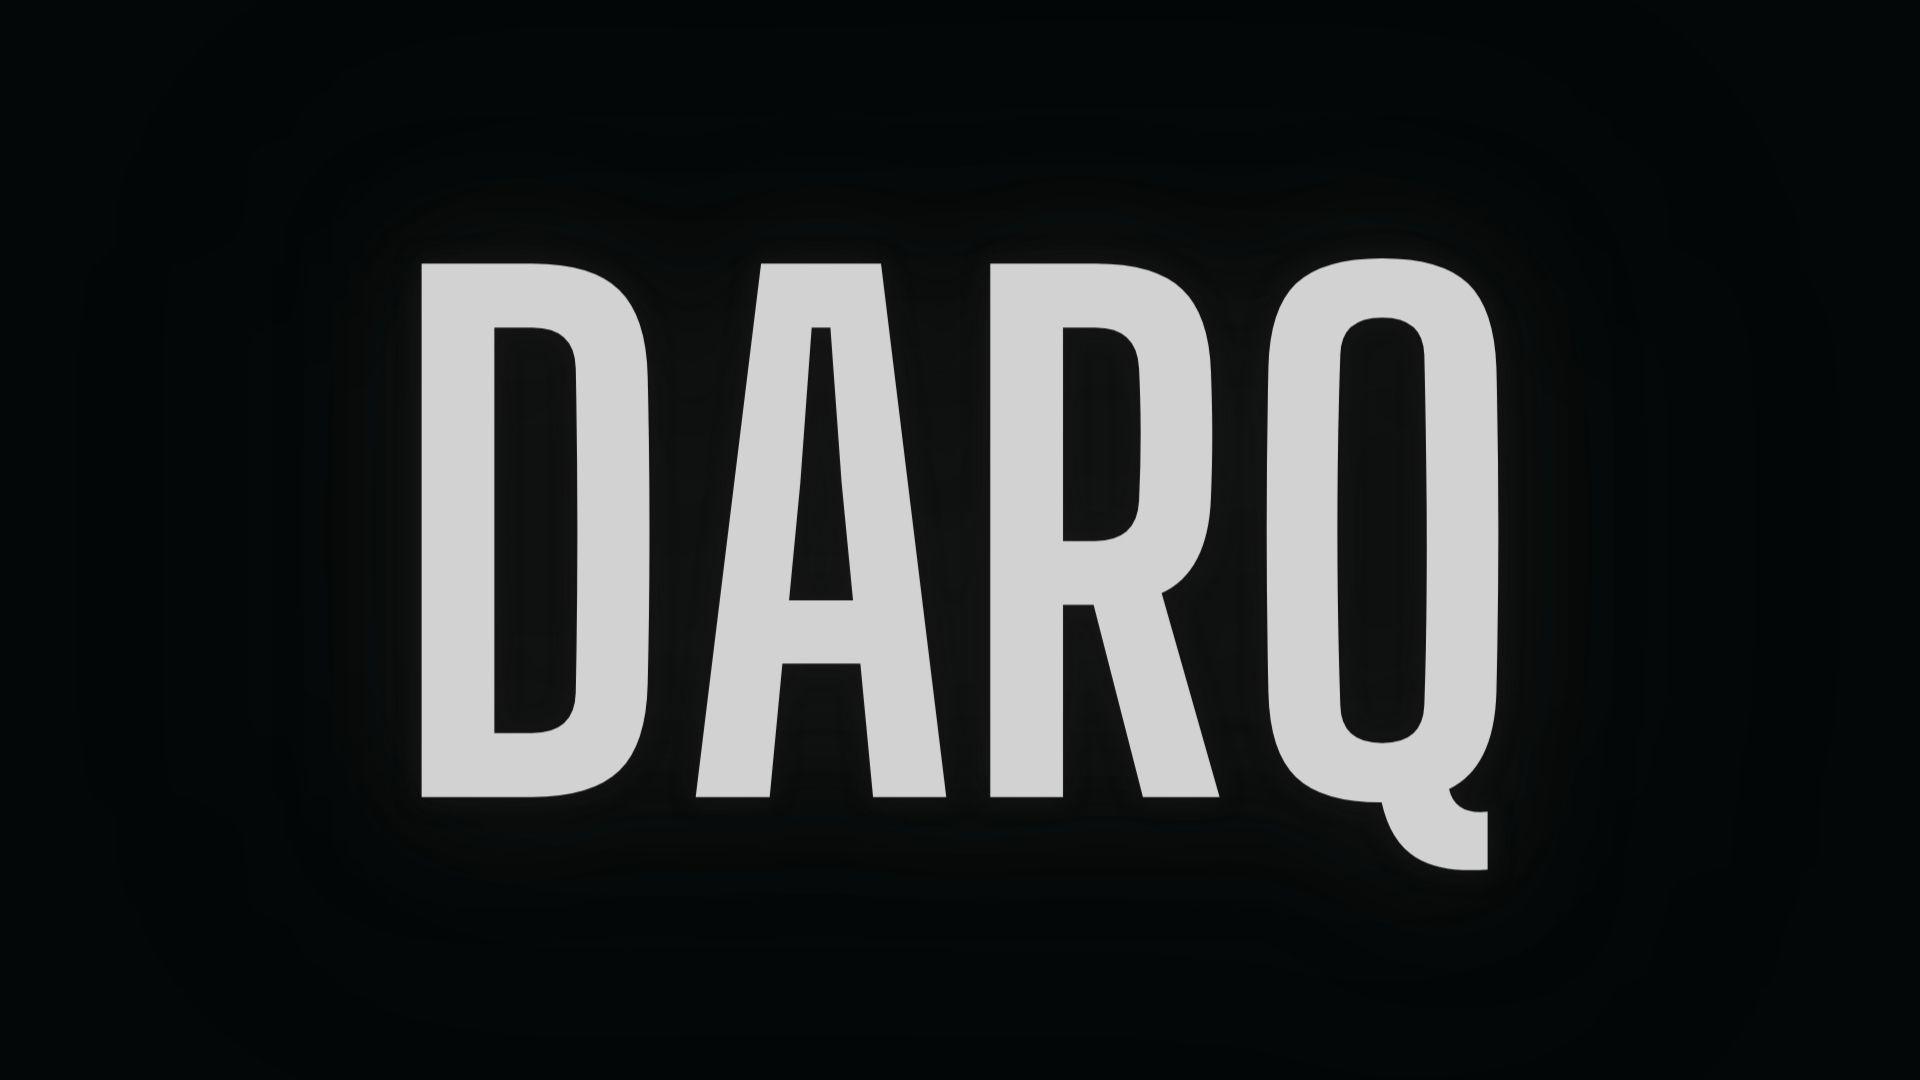 darq complete edition logo wallpaper 74068